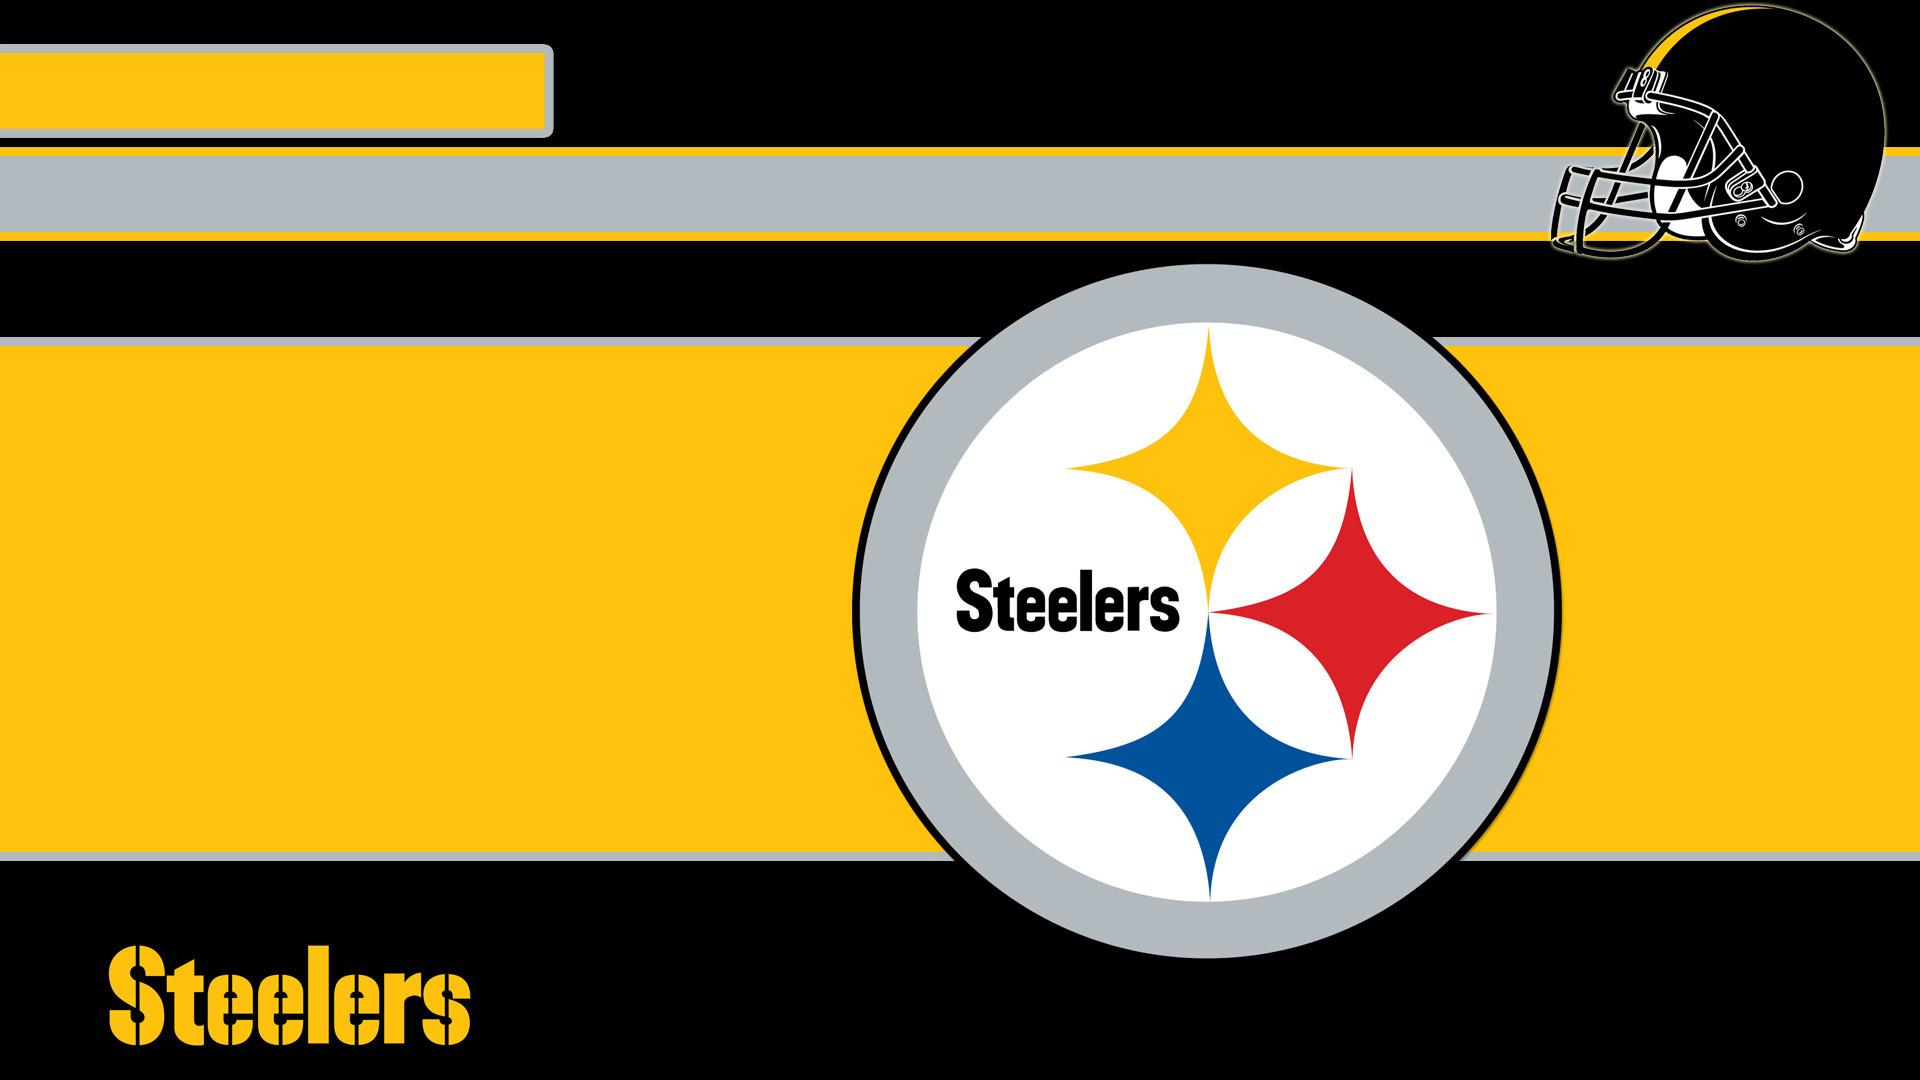 Steelers Edits 1080 1080